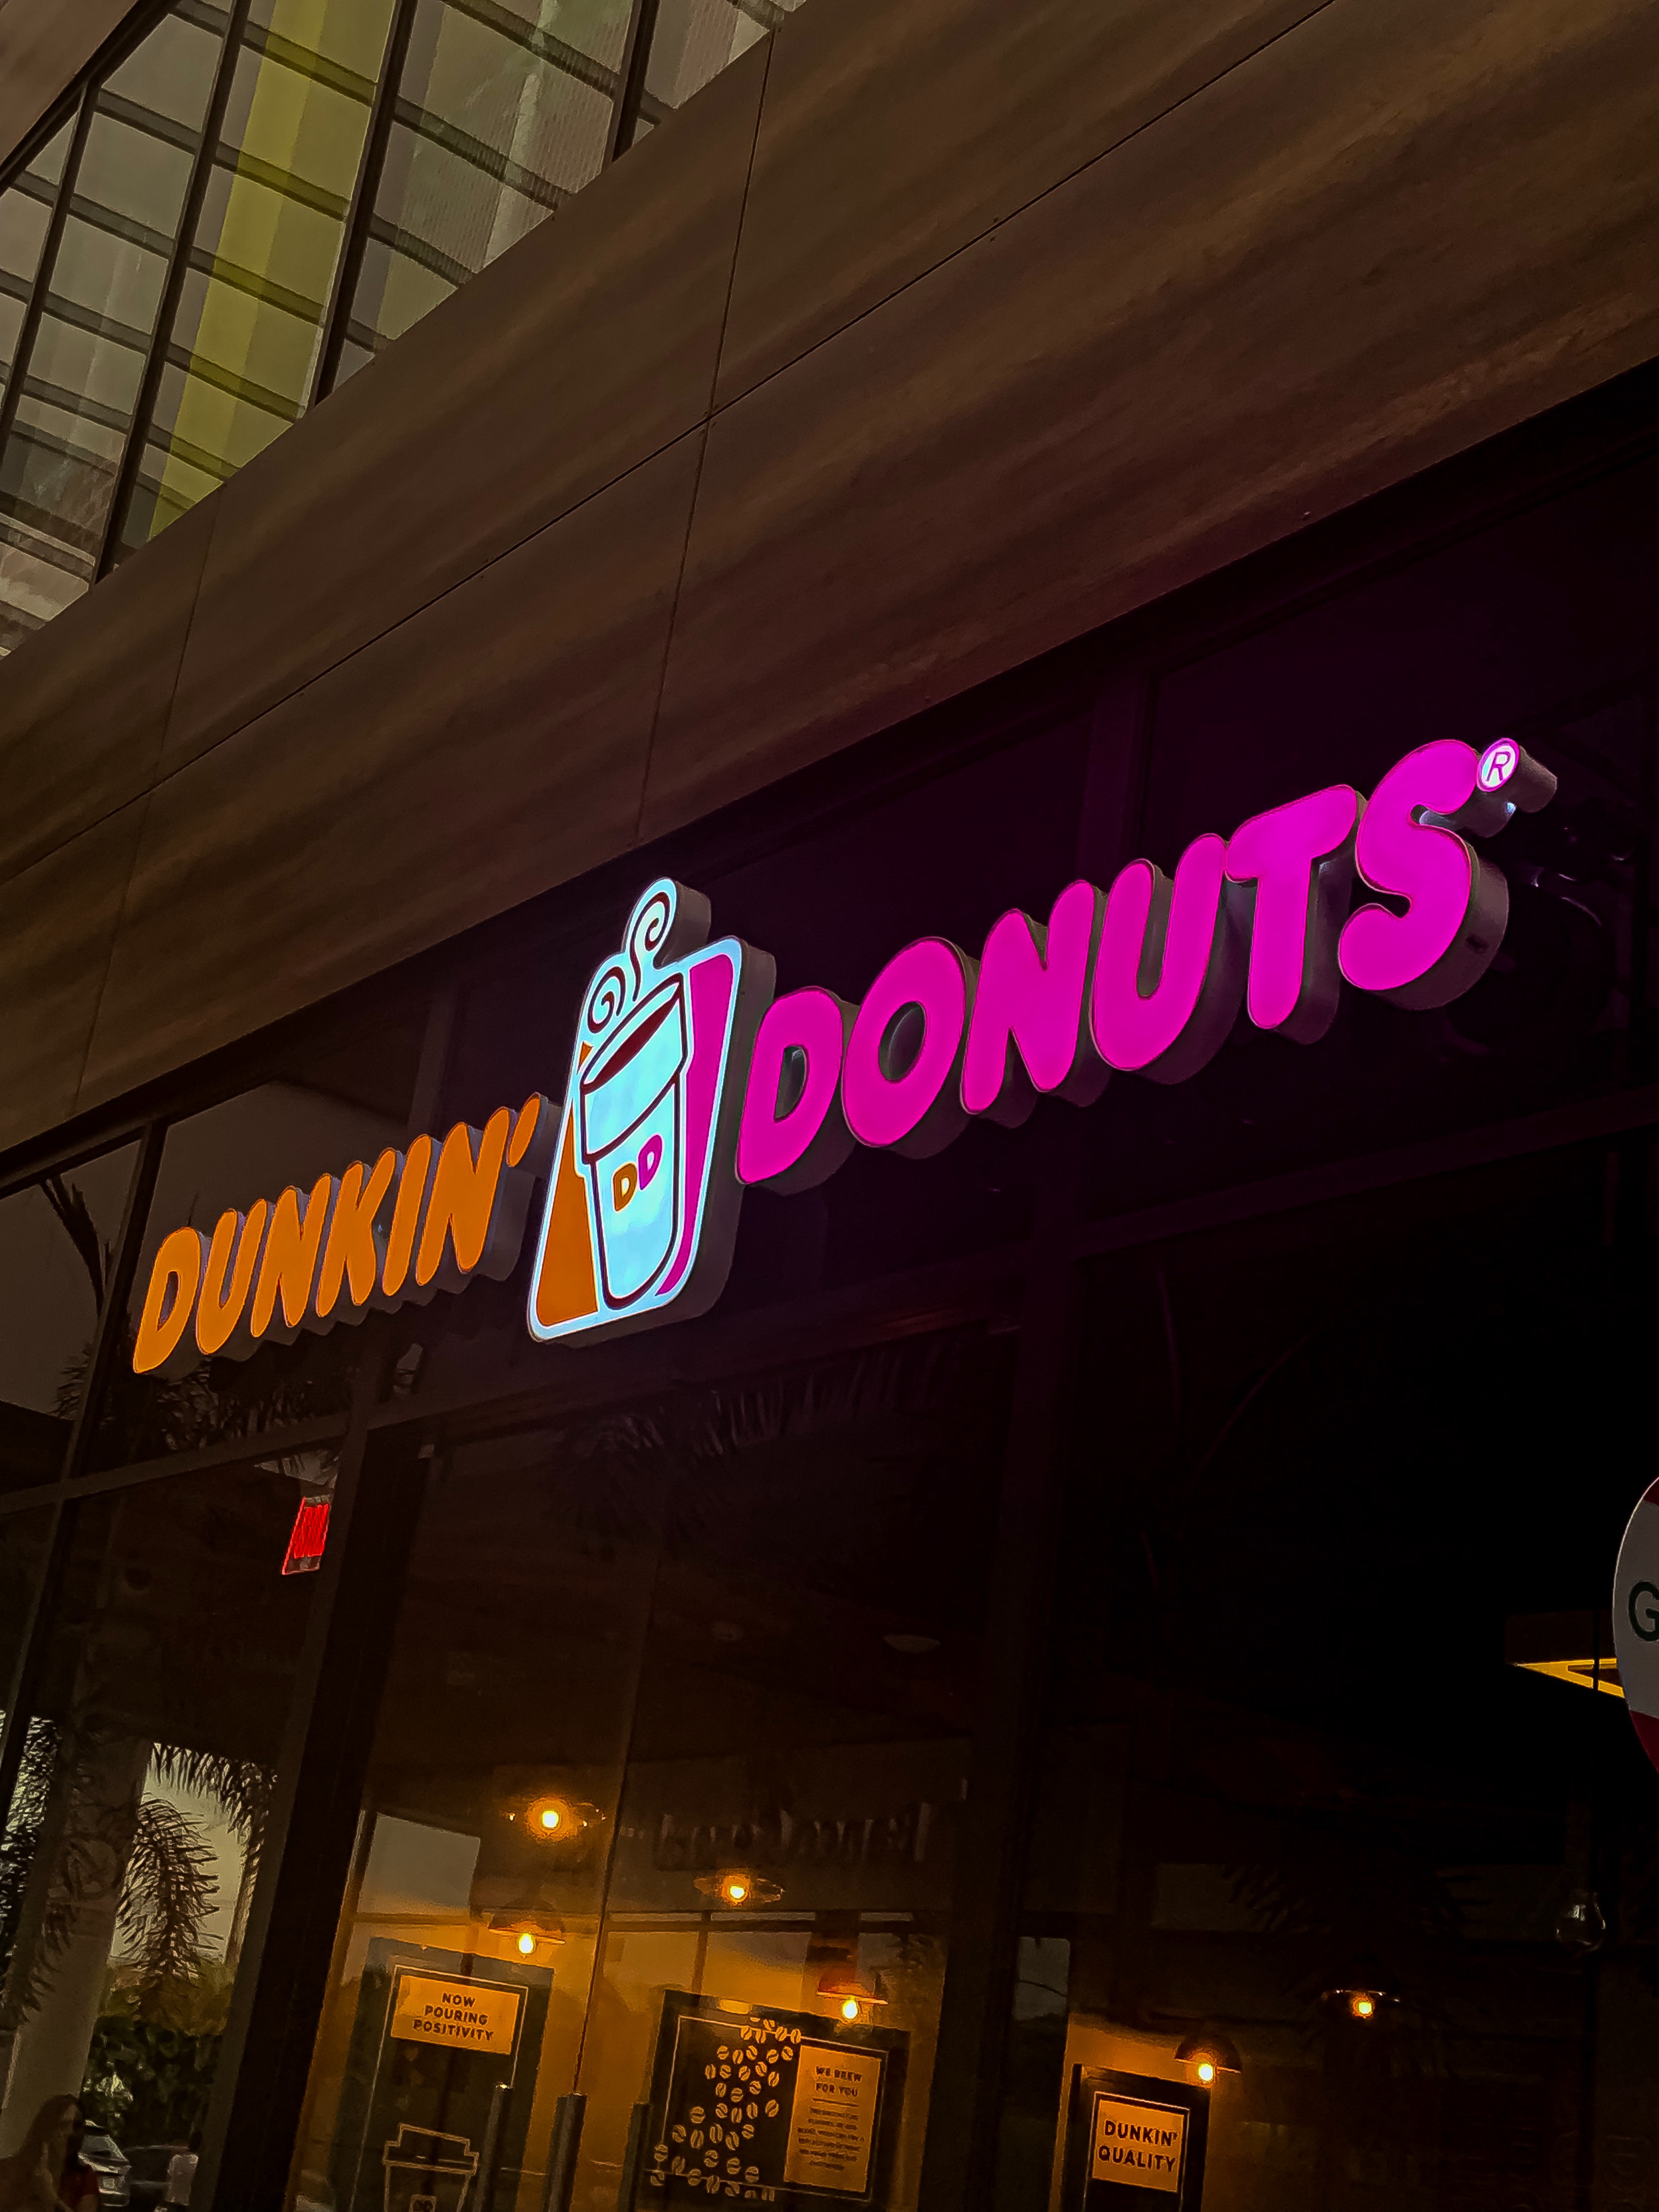 Dunkin Donuts Crew Member